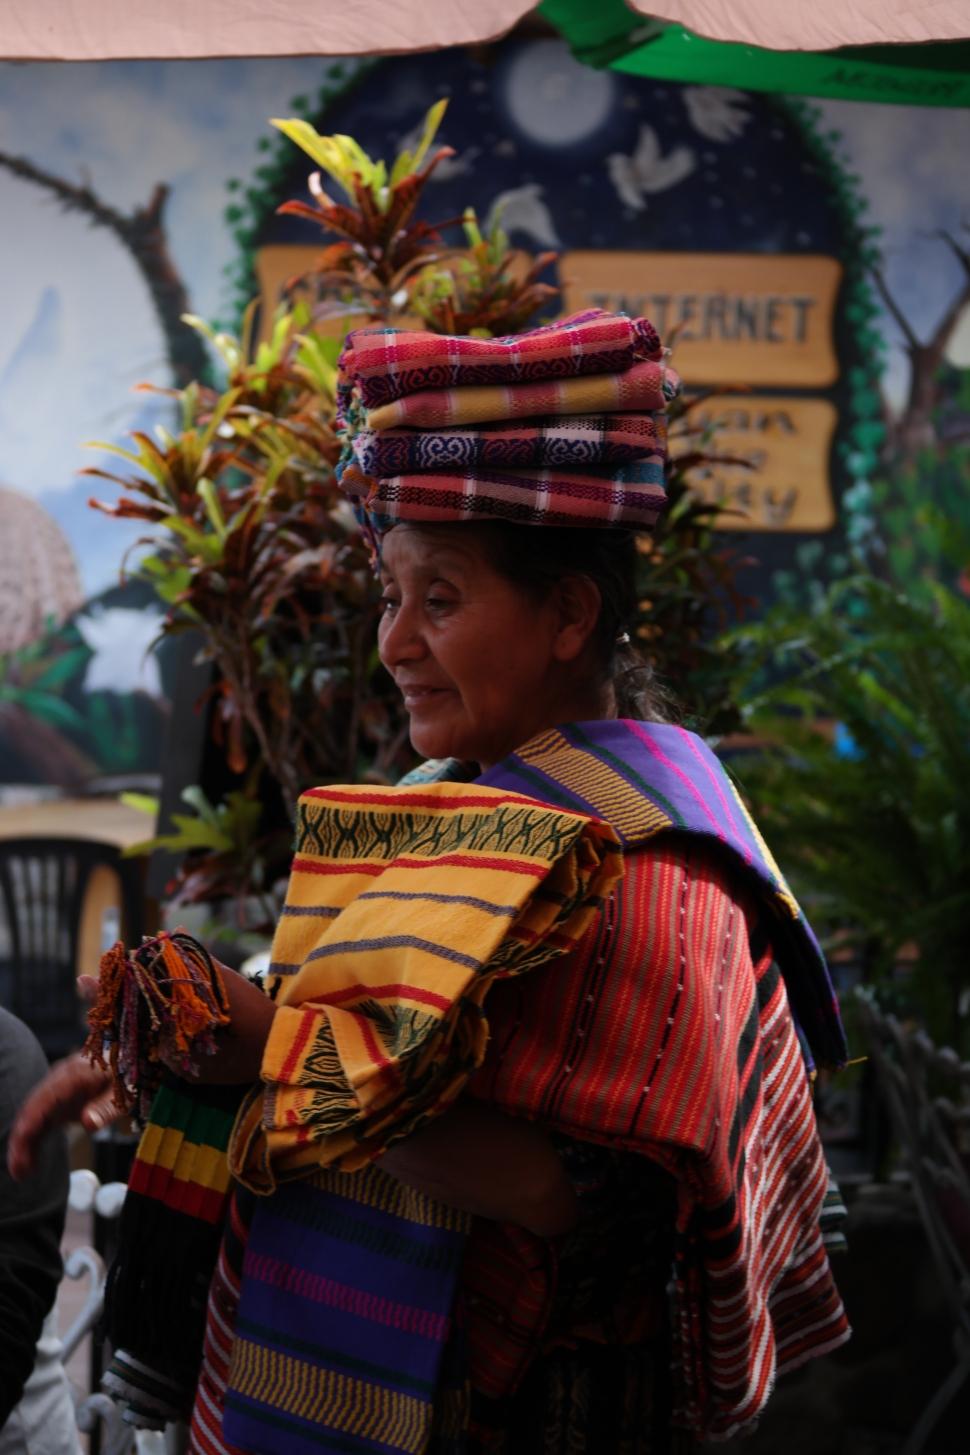 LakeAtitlan_Mayan_IndeginiousWoman_RCD_Shaikh2015